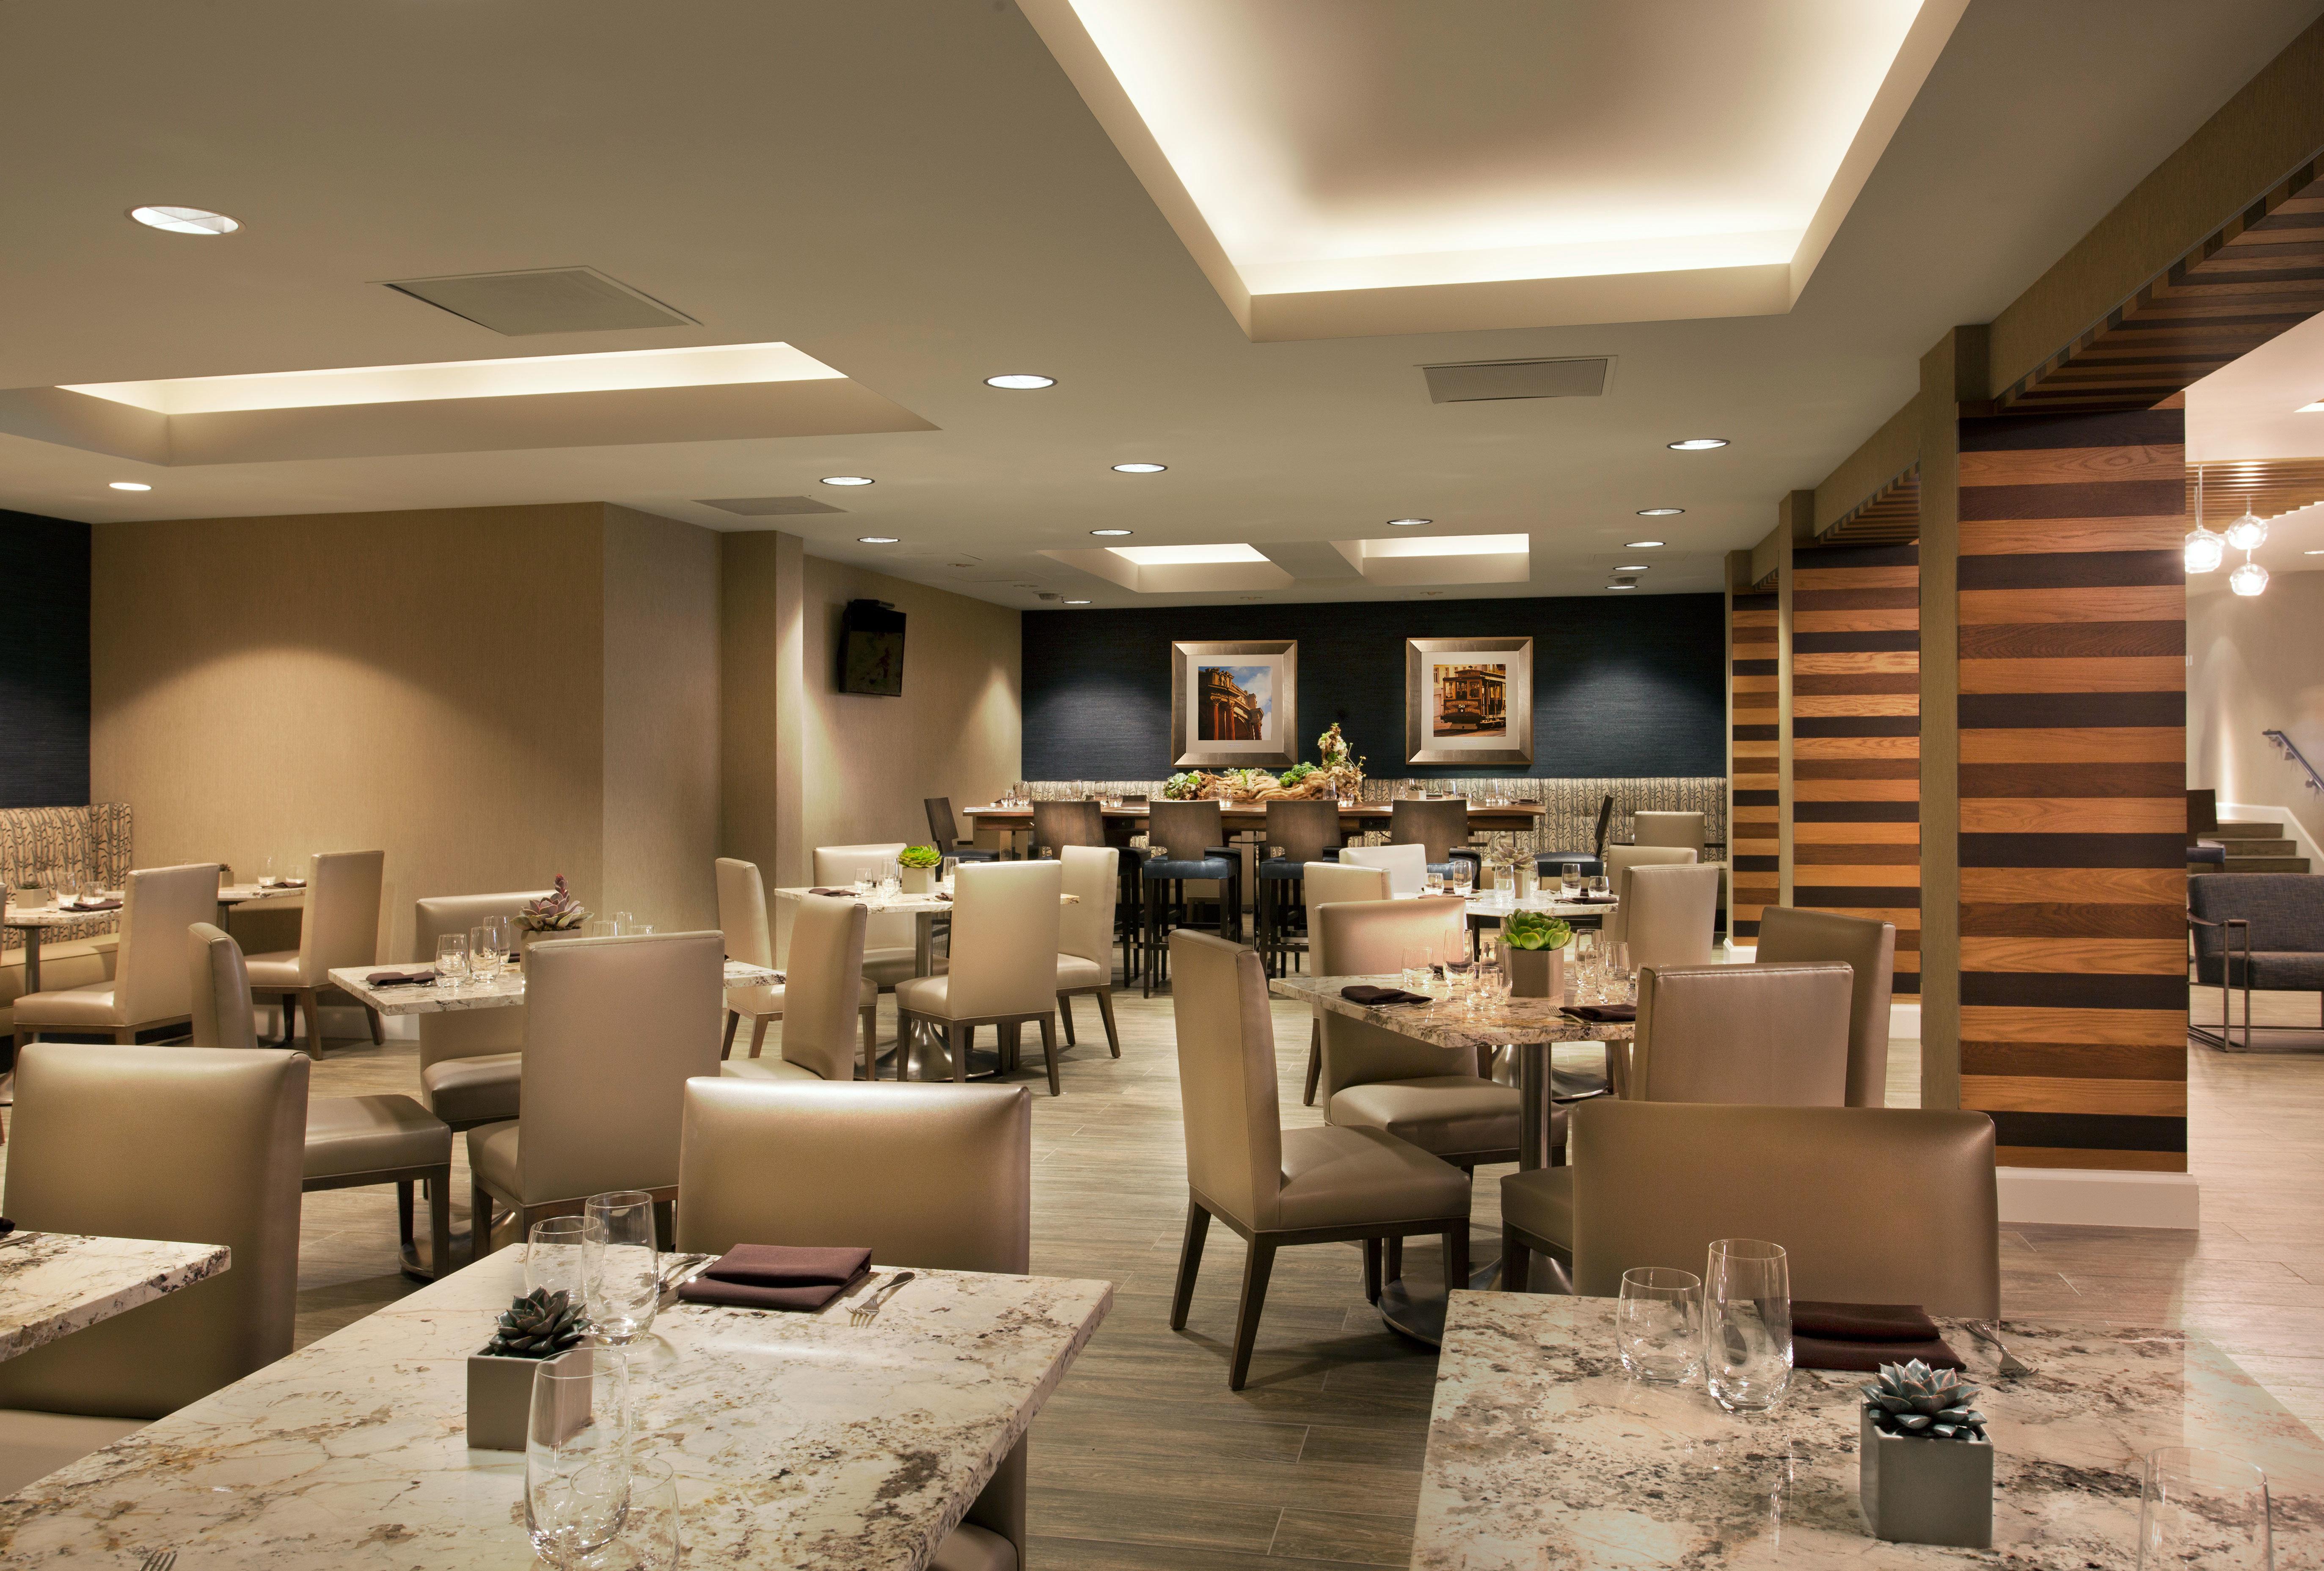 Lobby restaurant function hall conference hall living room condominium convention center café